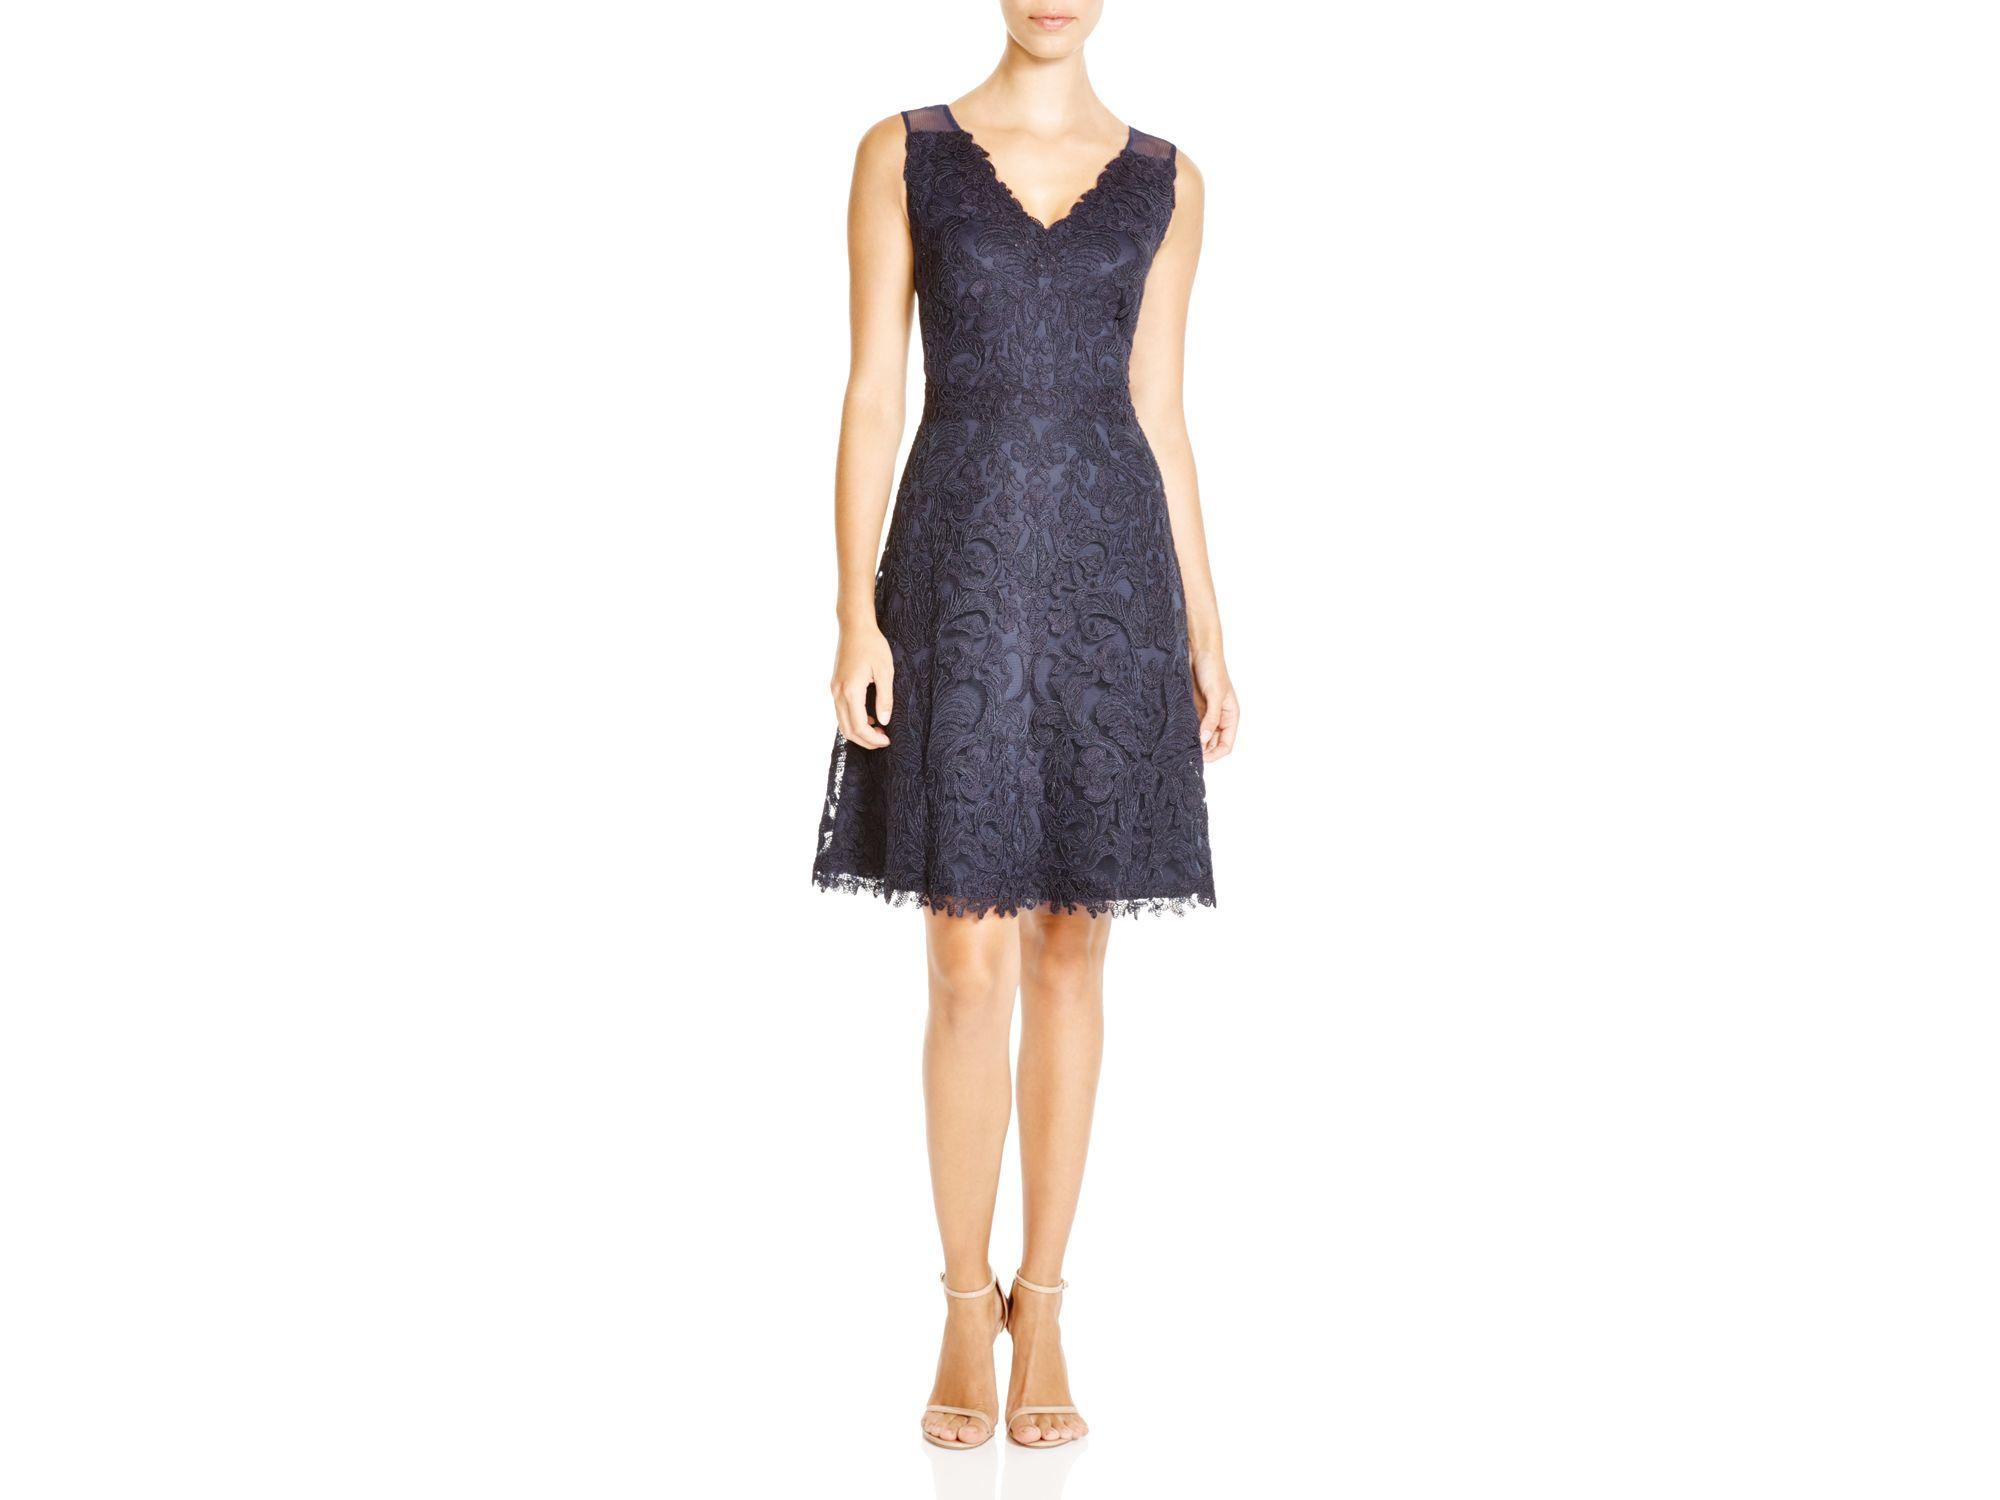 5e3d37775b9 Tadashi Shoji Petites Sleeveless Lace Fit And Flare Dress - 100 ...